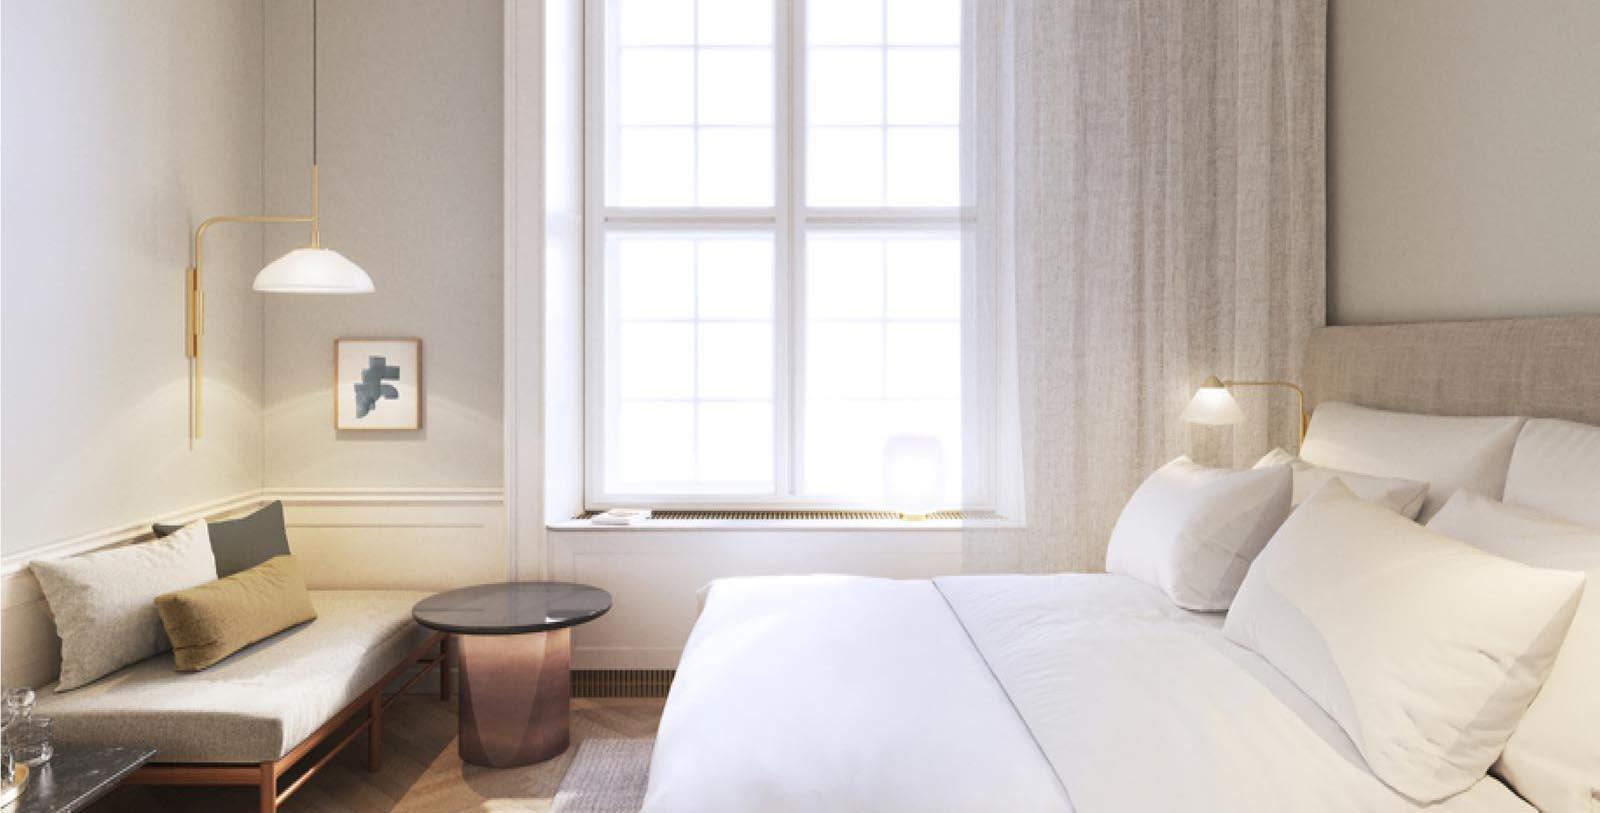 Image of Guestroom at Villa Copenhagen, 1912, Member of Historic Hotels Worldwide, in Copenhagen, Denmark, Location Map